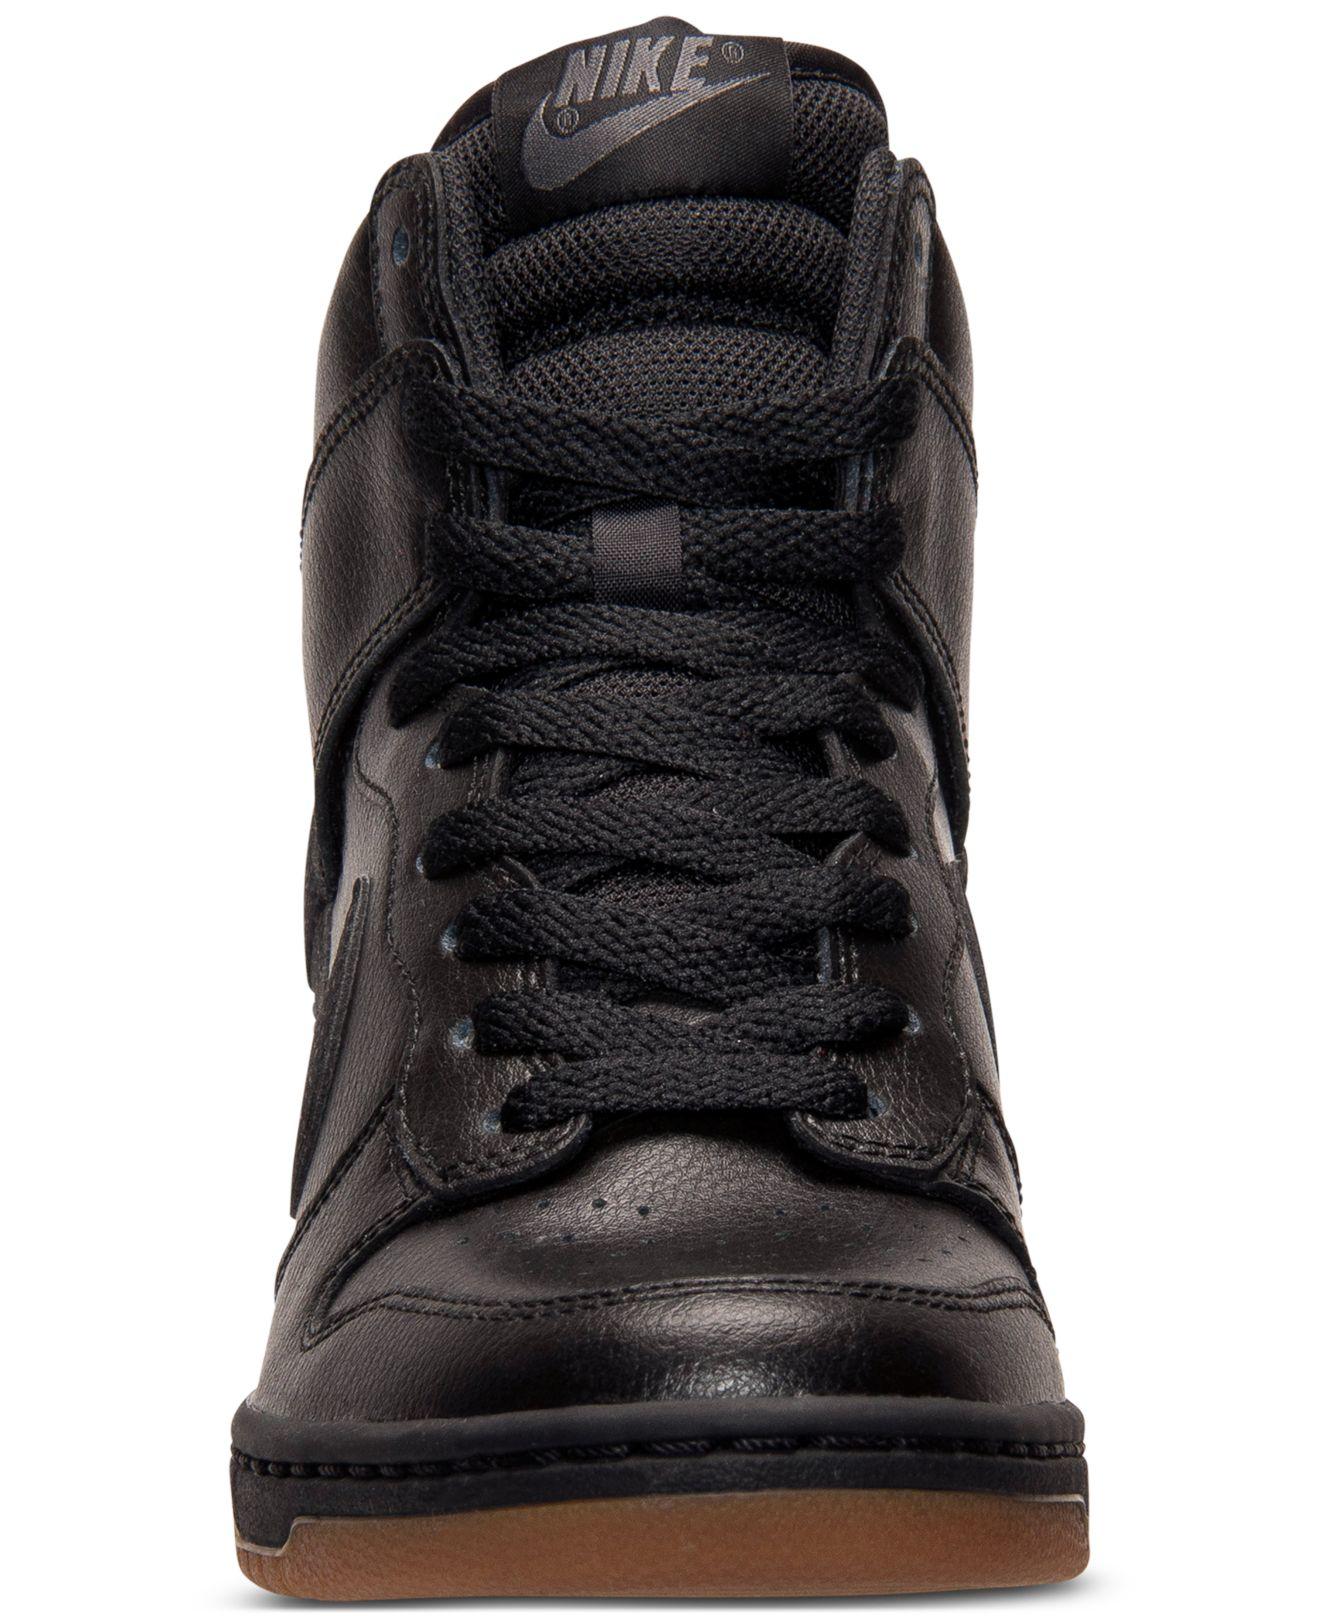 Lyst - Nike Dunk Sky Hi Essential Leather Sneakers In Black-6889